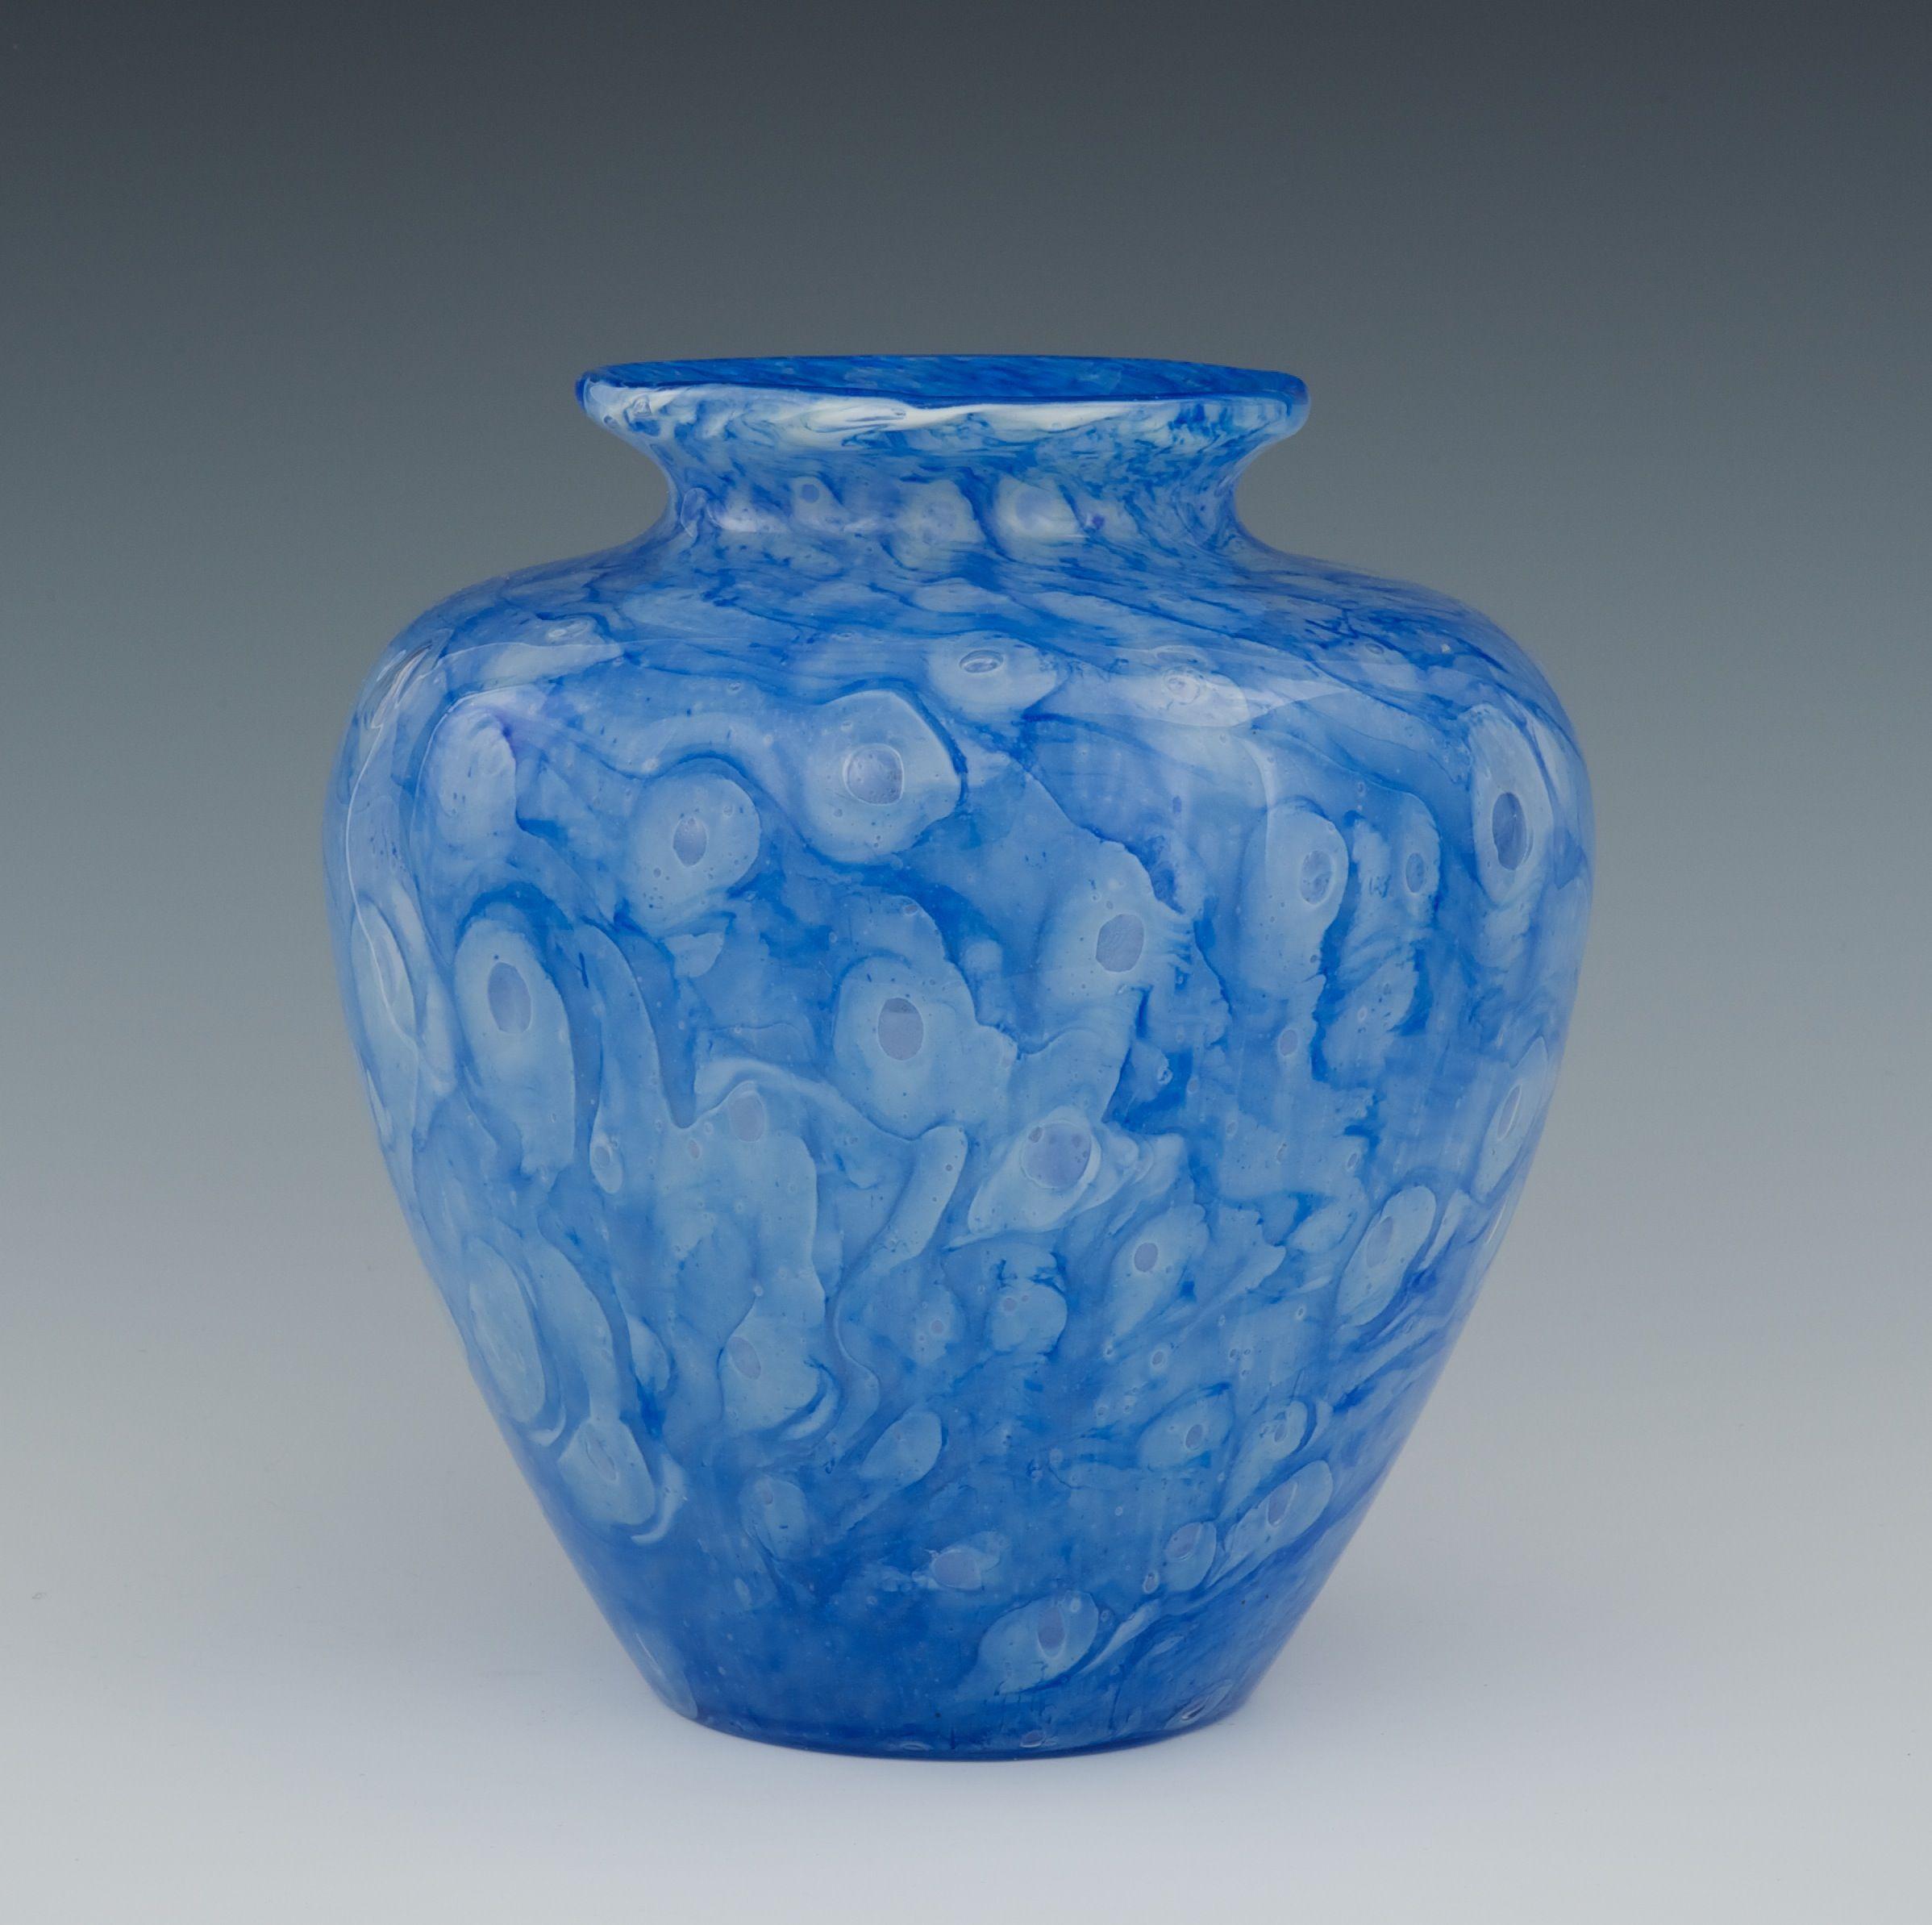 A steuben cluthra vase 092410 sold 253 steuben pinterest a steuben cluthra vase 092410 sold 253 steuben glassshattered glassantique reviewsmspy